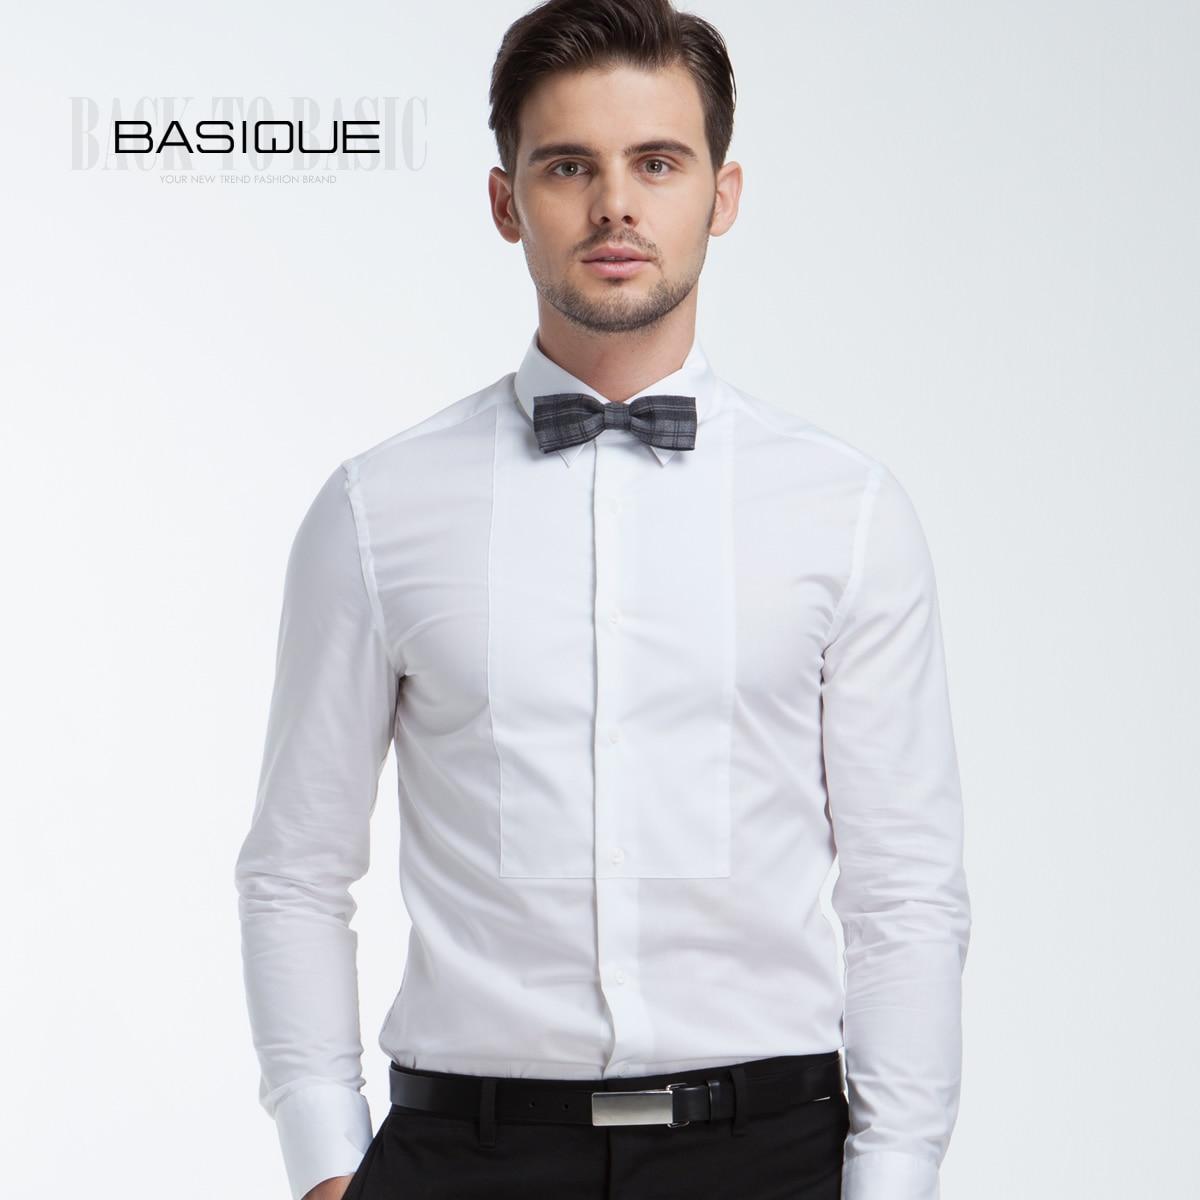 Aliexpress.com : Buy Basique book men&-39-s clothing white brief ...